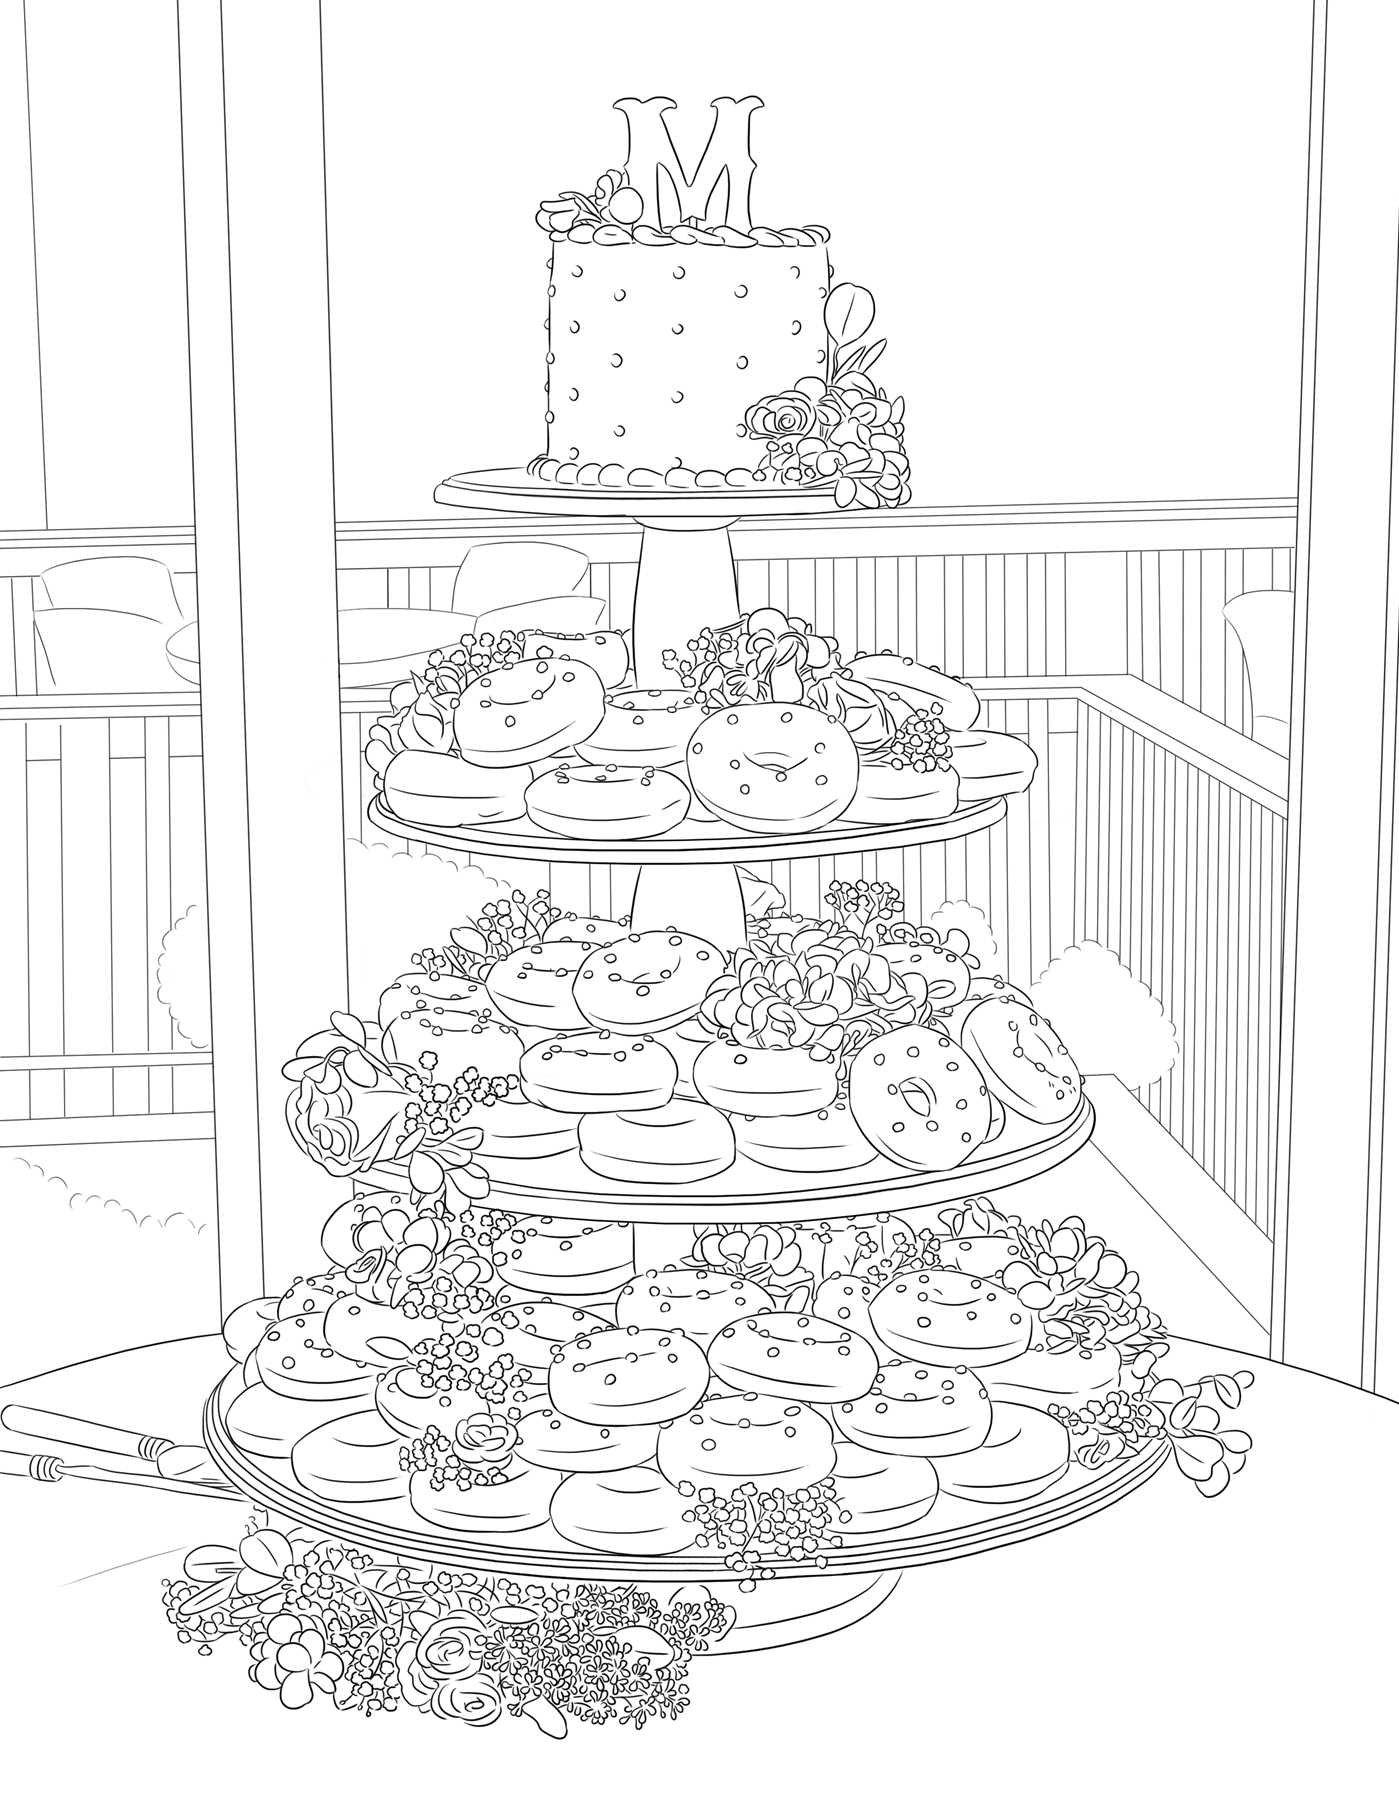 coloring book wedding : Amazon Com The Maci And Taylor Wedding Album An Adult Coloring Book 9781682613221 Maci Bookout Taylor Mckinney Books